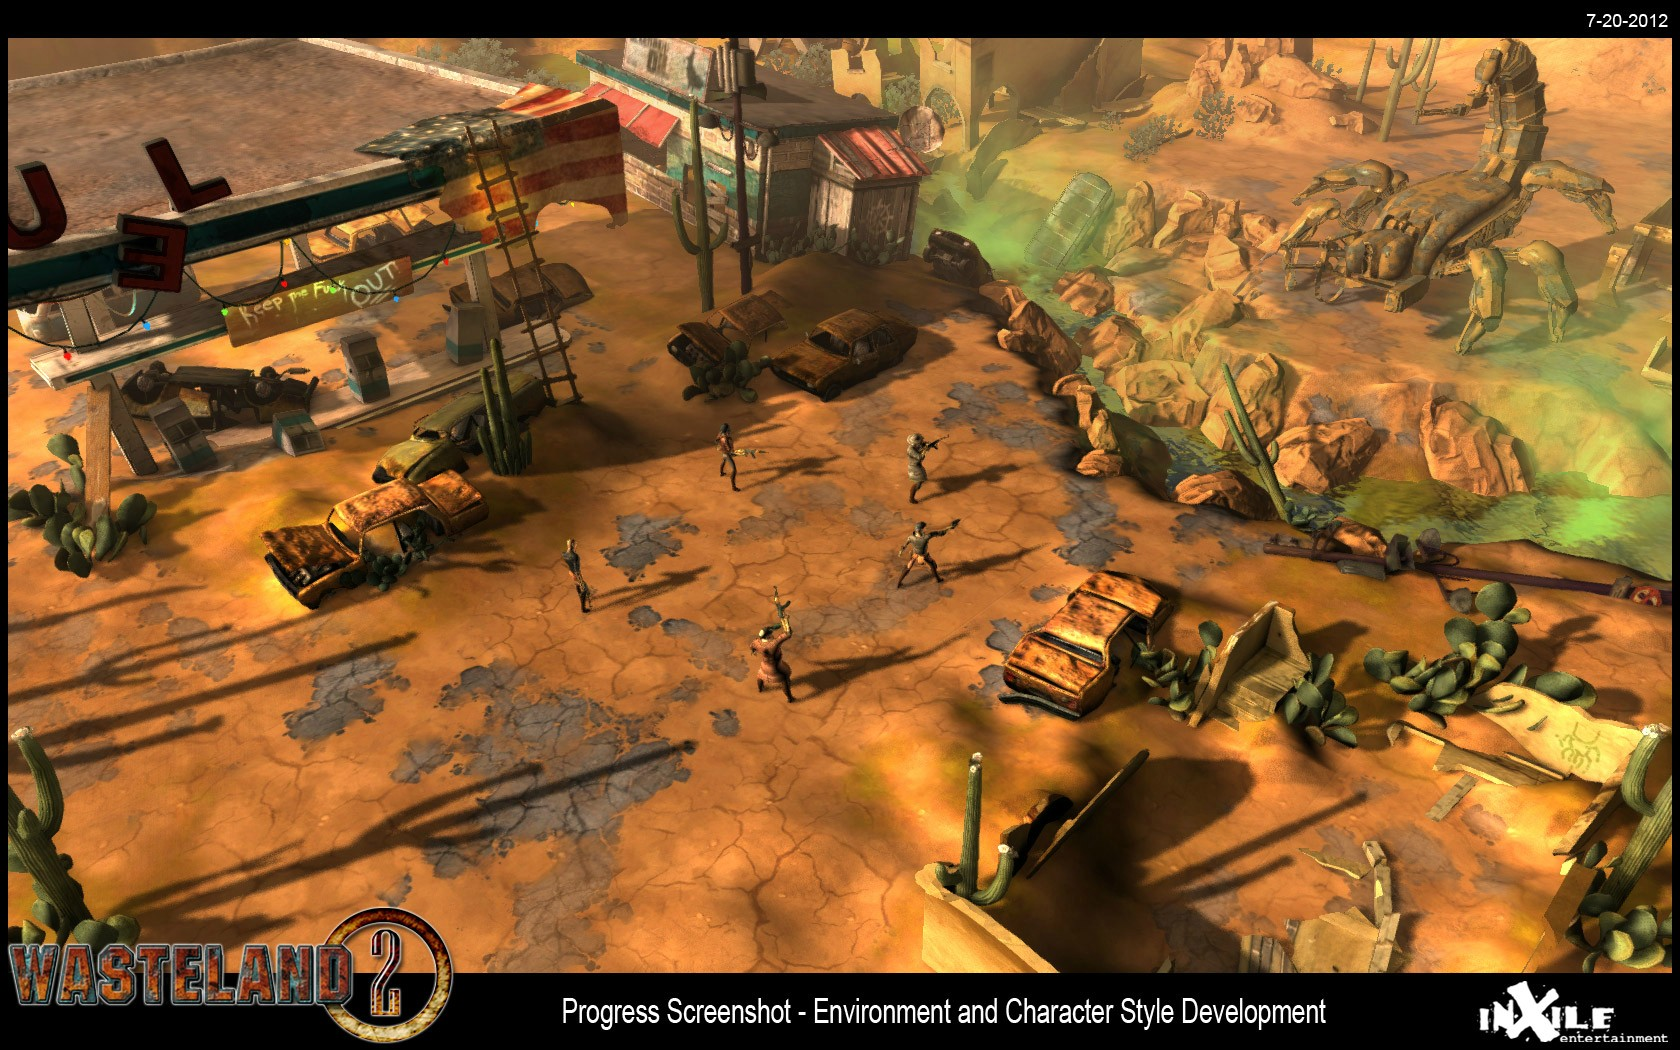 wasteland2 - primeira imagem